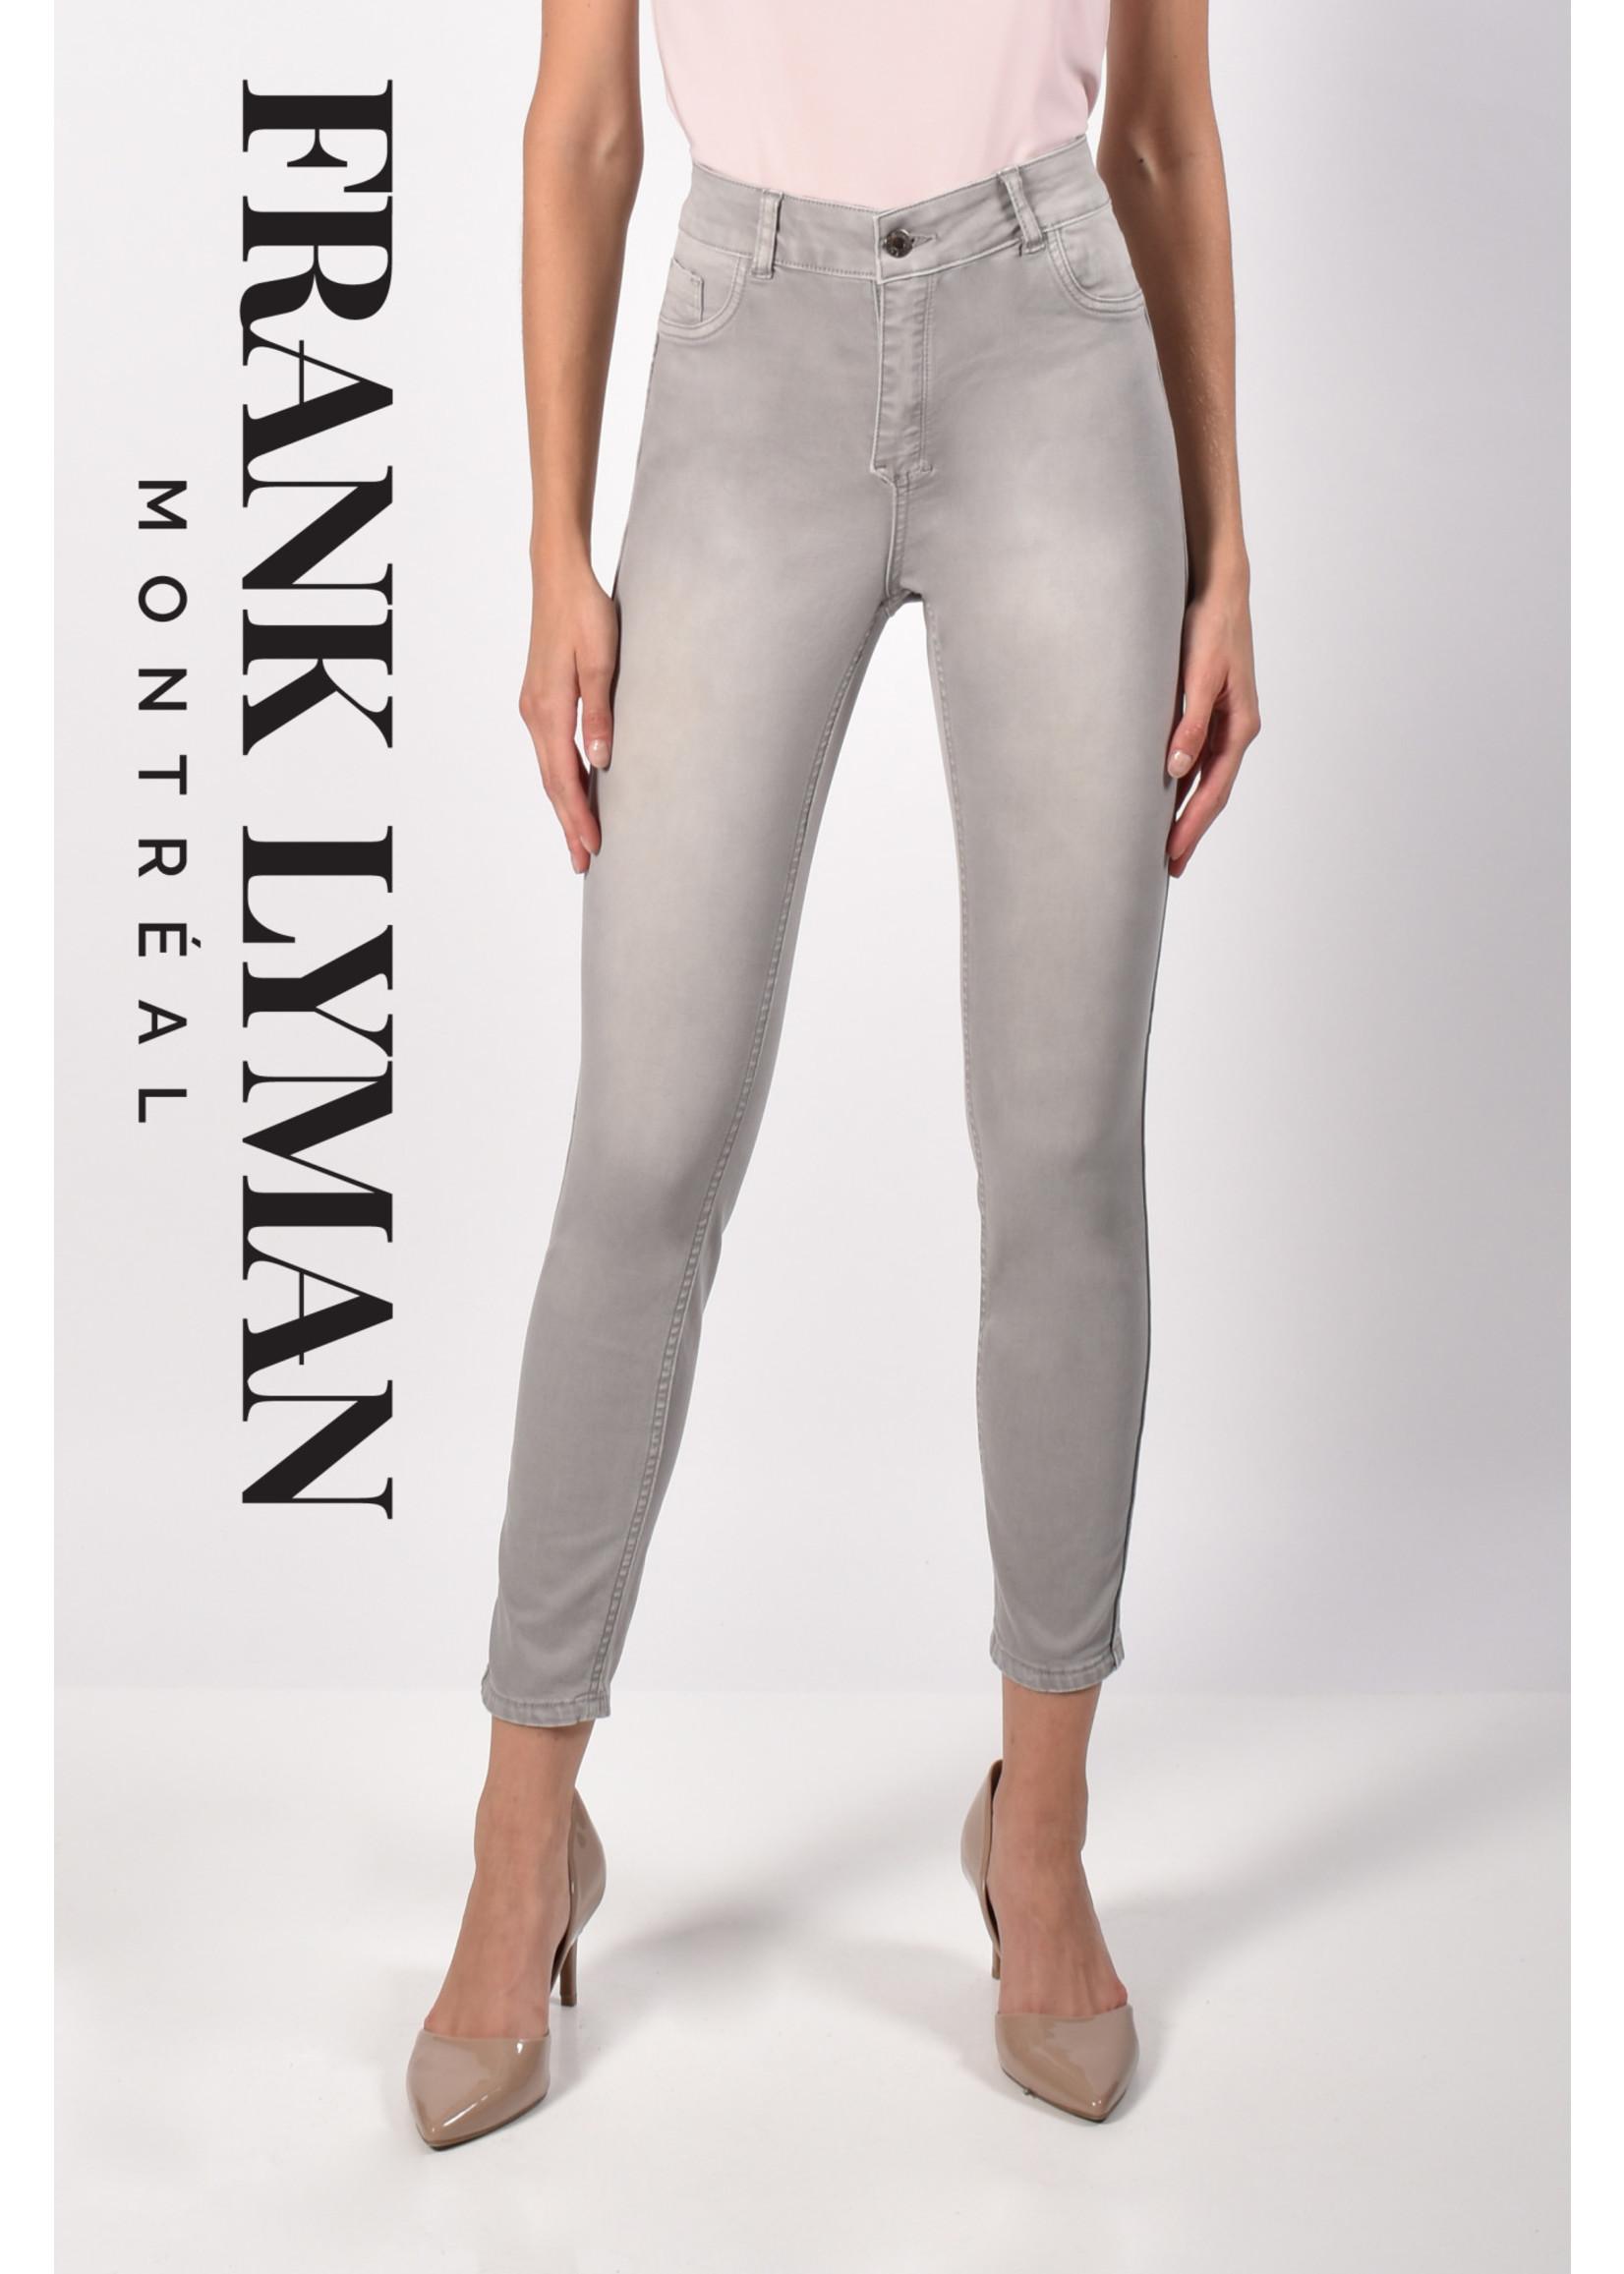 Frank Lyman Floral/Grey Reversible Jeans